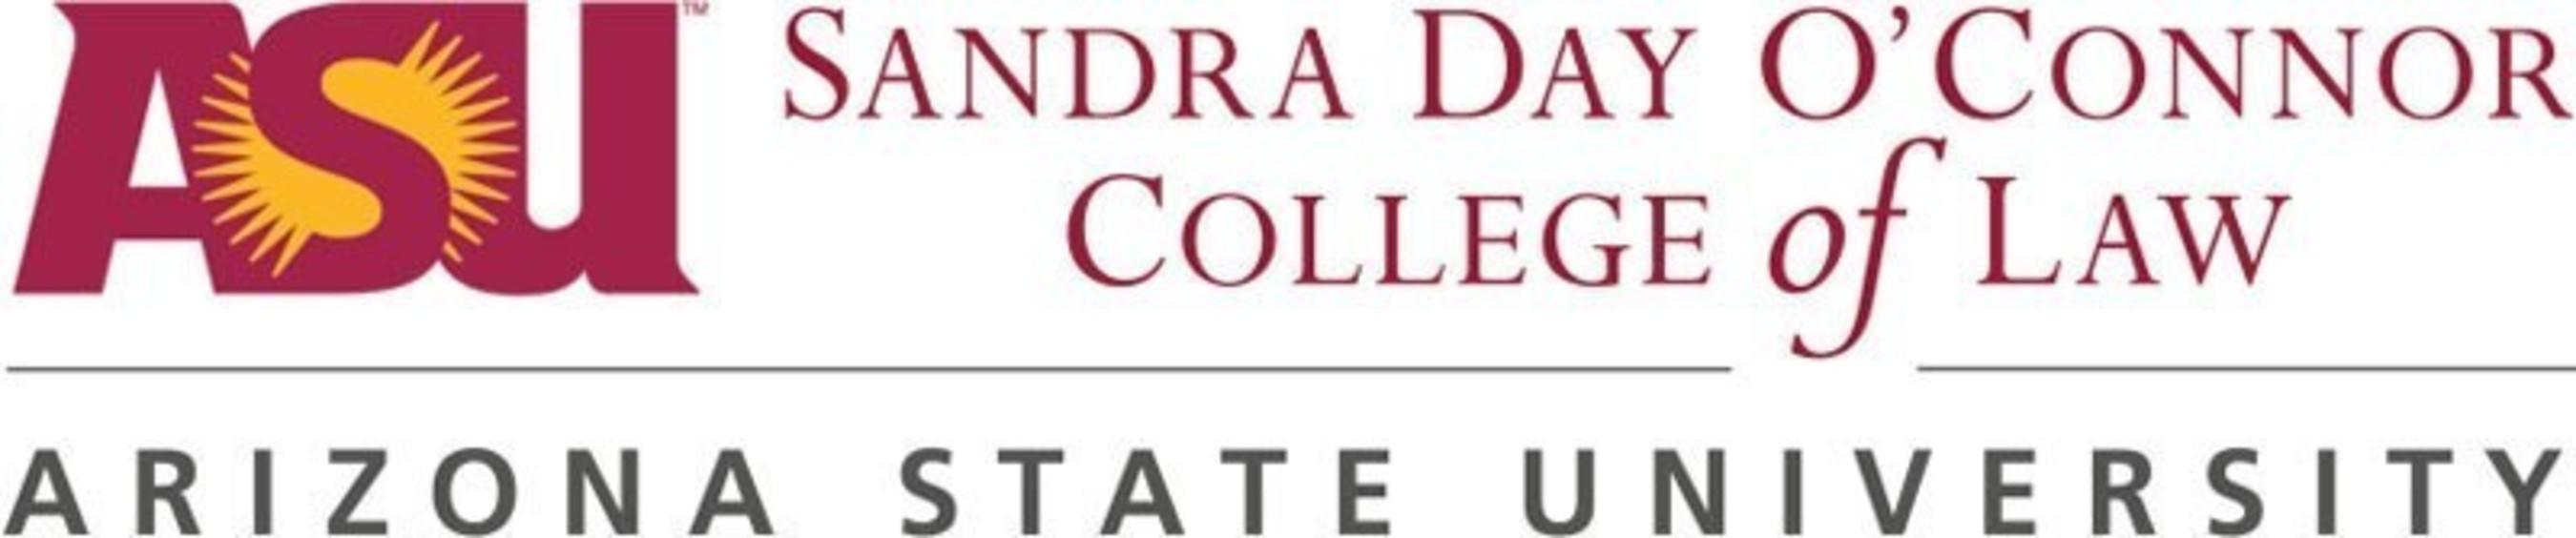 Arizona State University Sandra Day O'Connor College of Law.